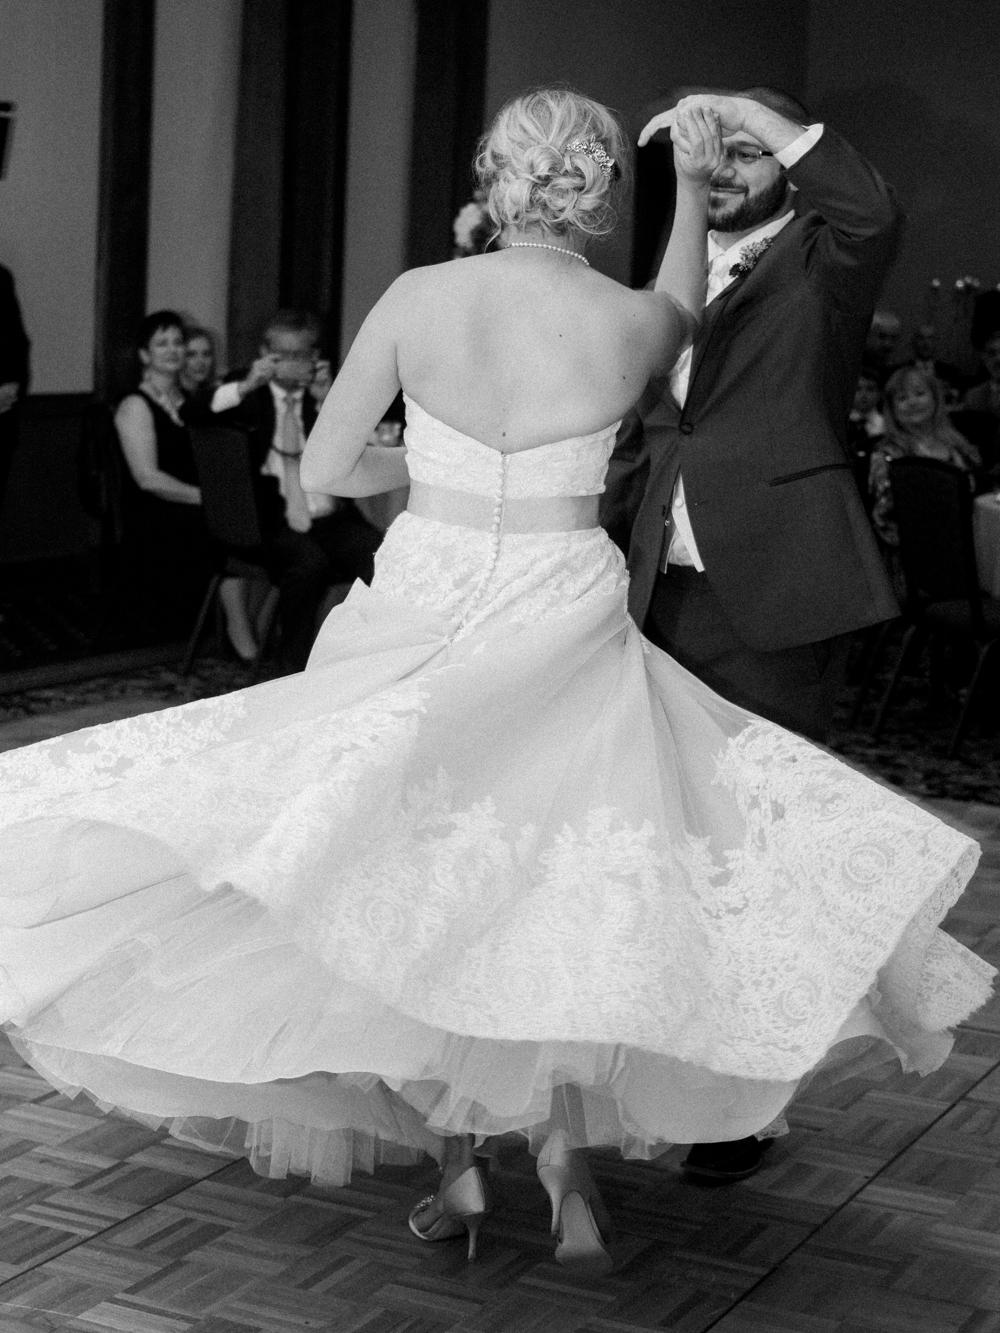 Houston wedding photographer - Christine Gosch - Houston film photographer - greek wedding in Houston - Annunciation Greek Orthodox church in Houston, Texas - Houston wedding planner -41.jpg